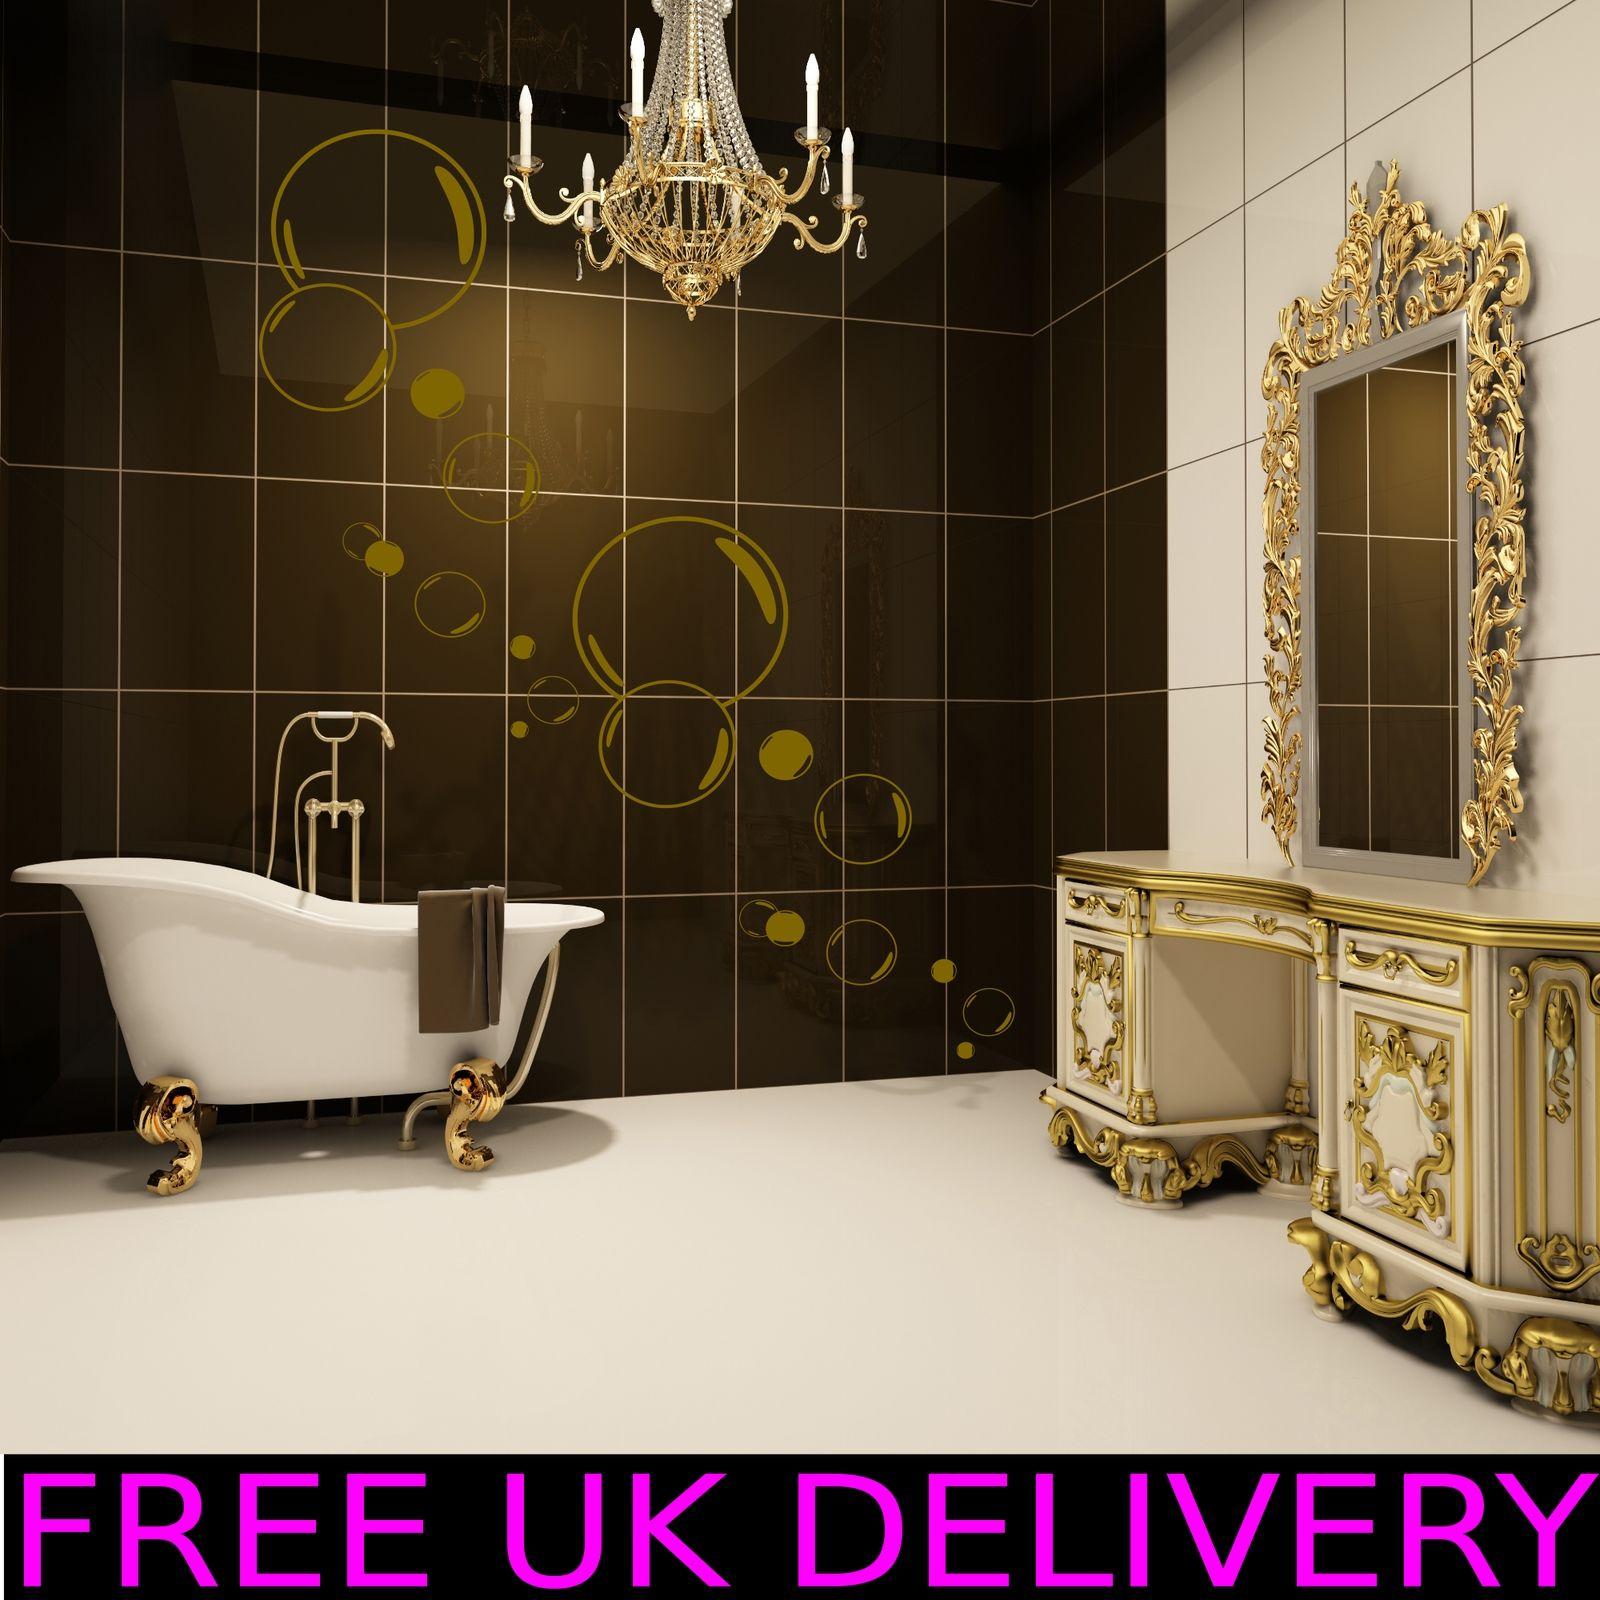 Large Big Bubbles Bathroom Wall Art Stickers Decal Vinyl Transfers ...